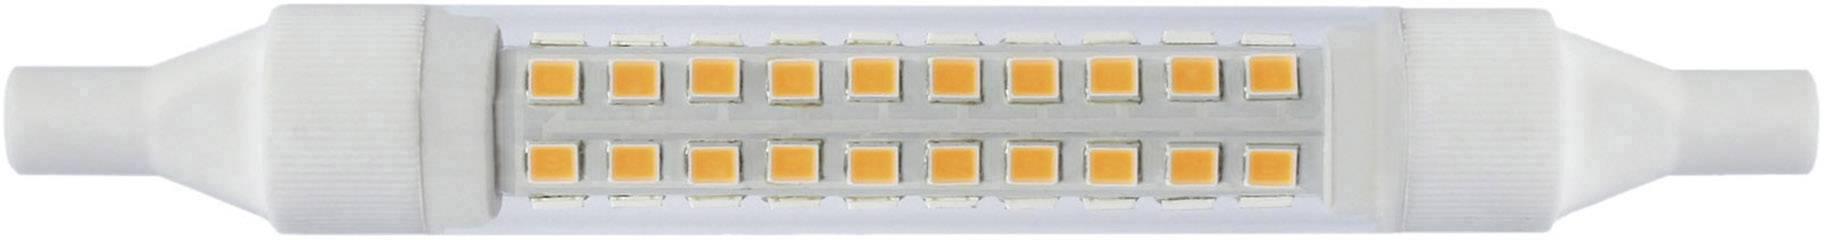 R7s Röhrenform 3.5 W = 40 W Warmweiß 20 mm x DioDor LED EEK A+ Ø x L A++ - E